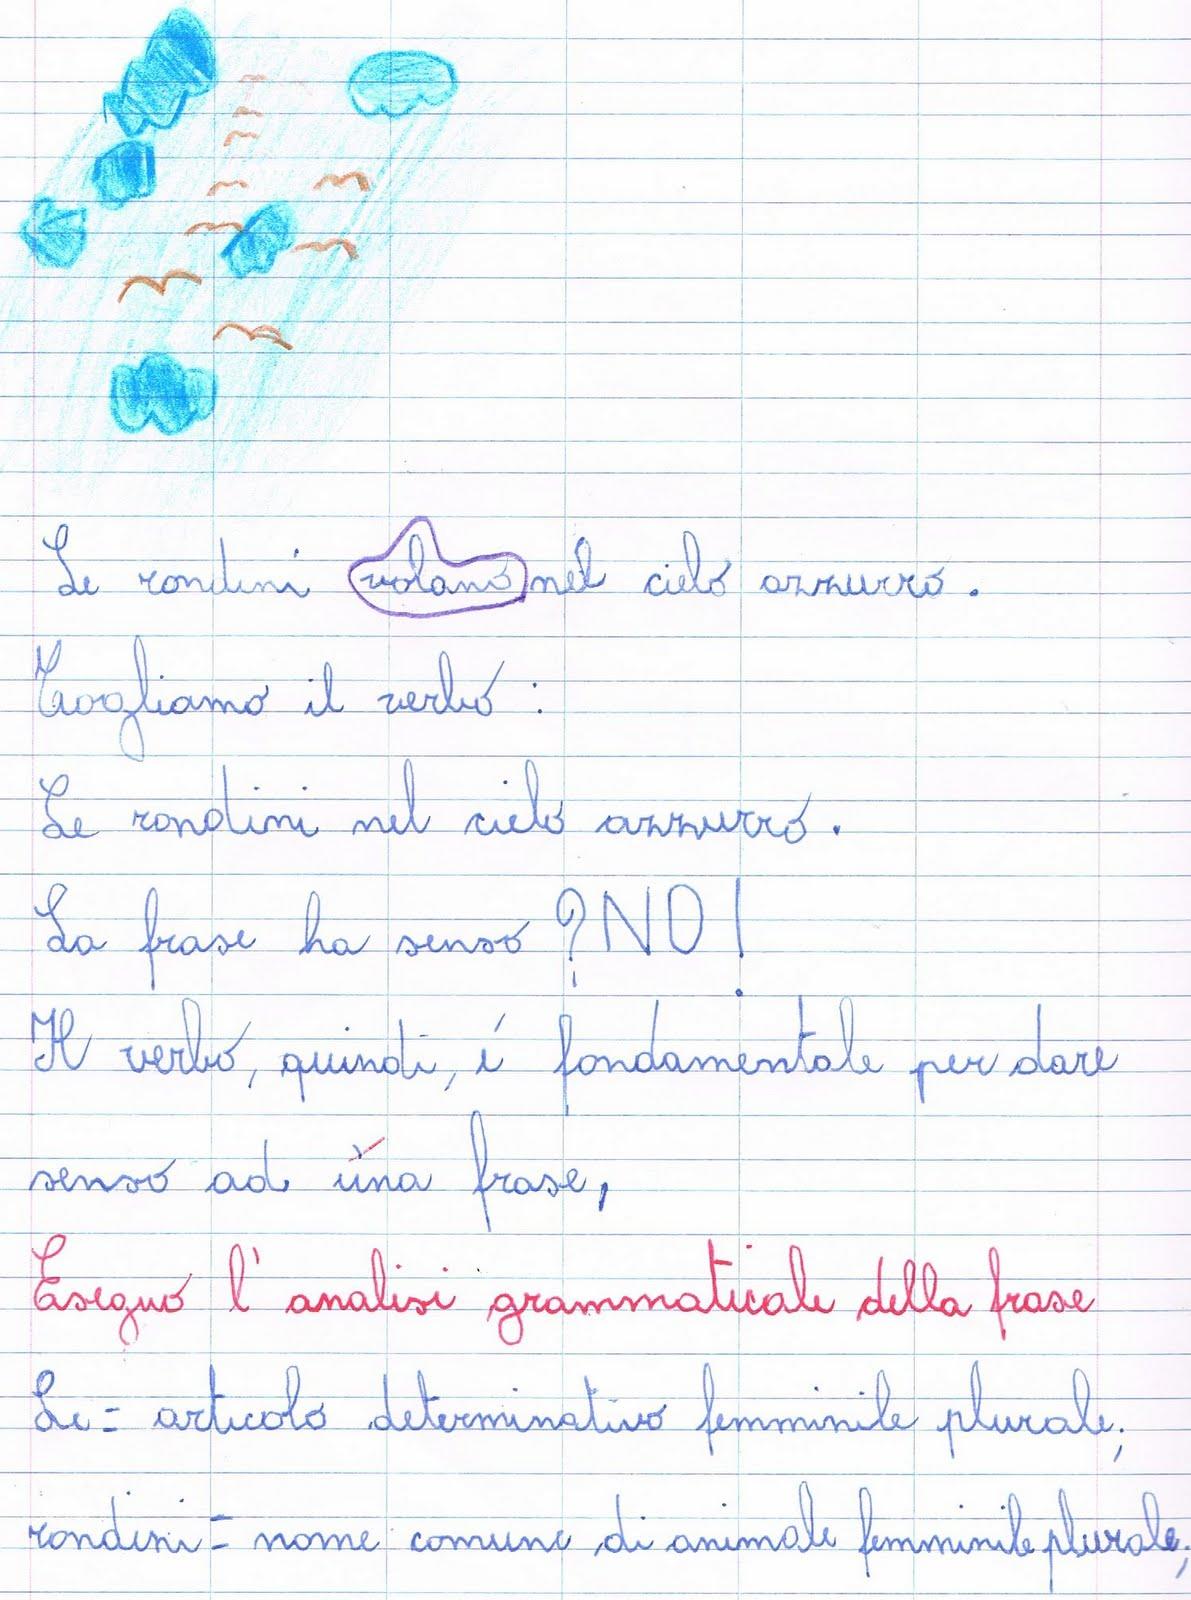 Esercizi Di Analisi Grammaticale Per La Classe Seconda